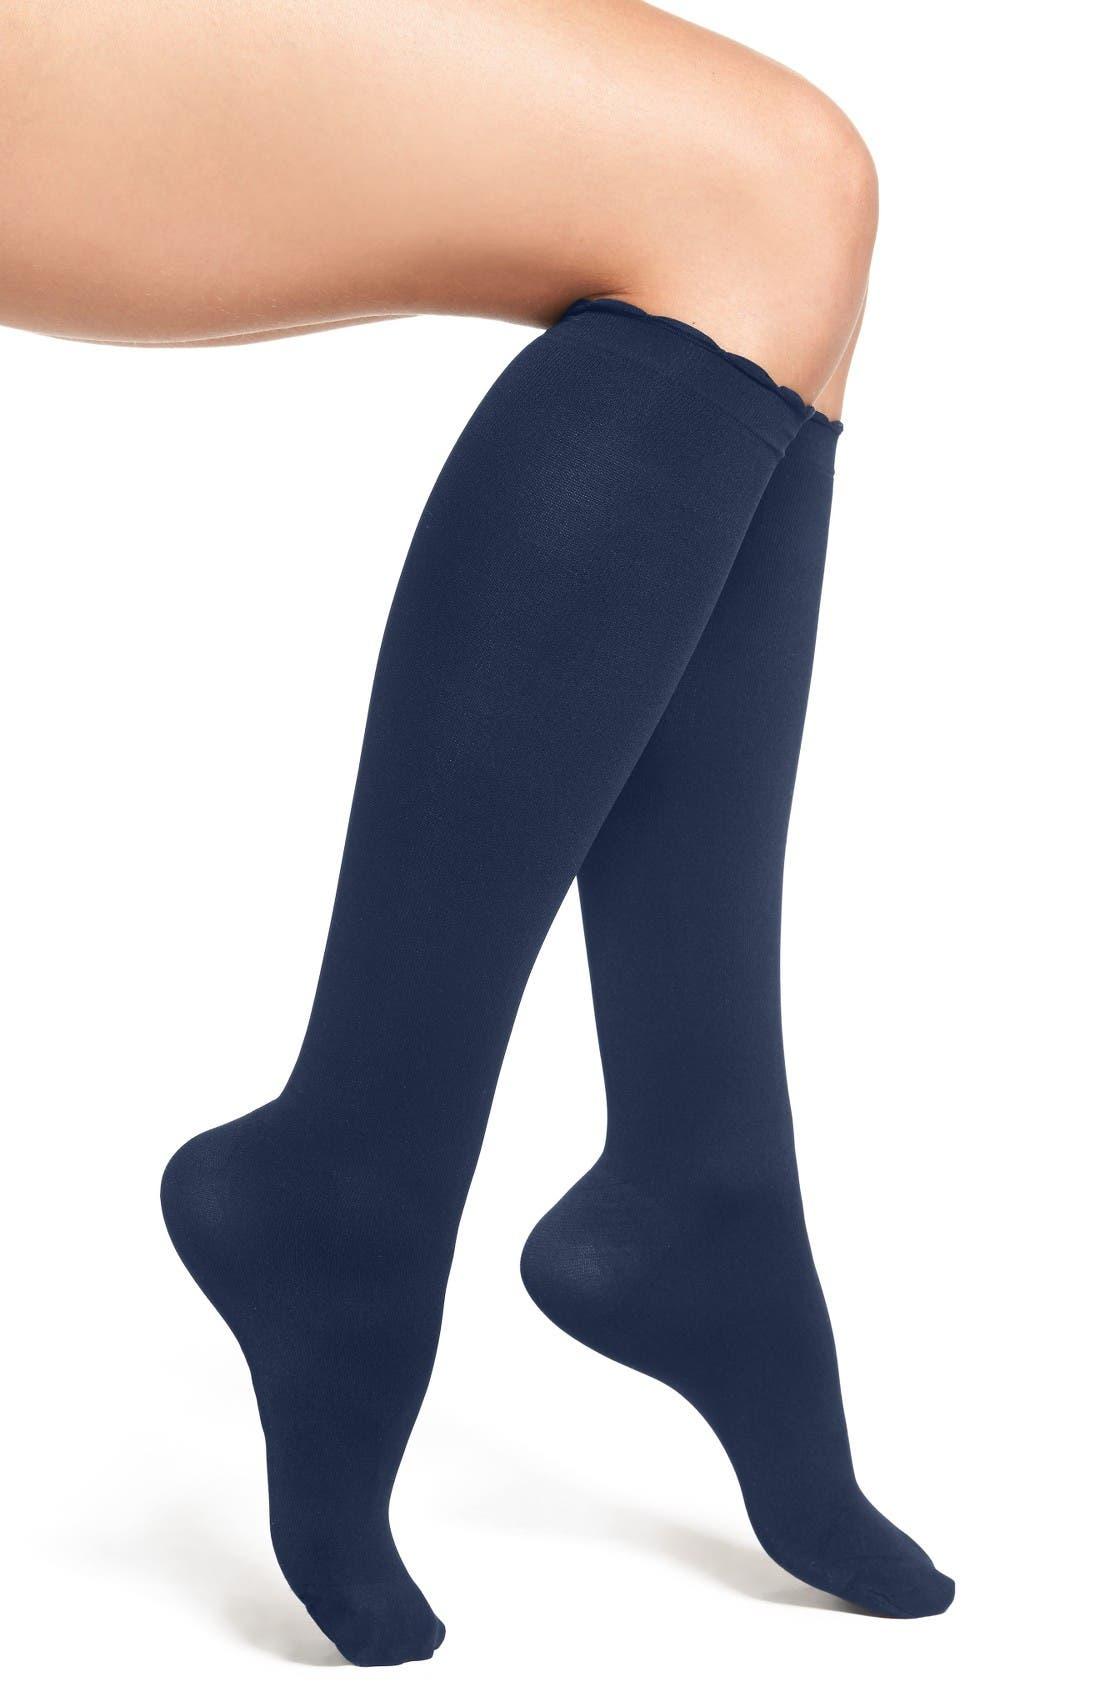 Compression Trouser Socks,                         Main,                         color, Navy